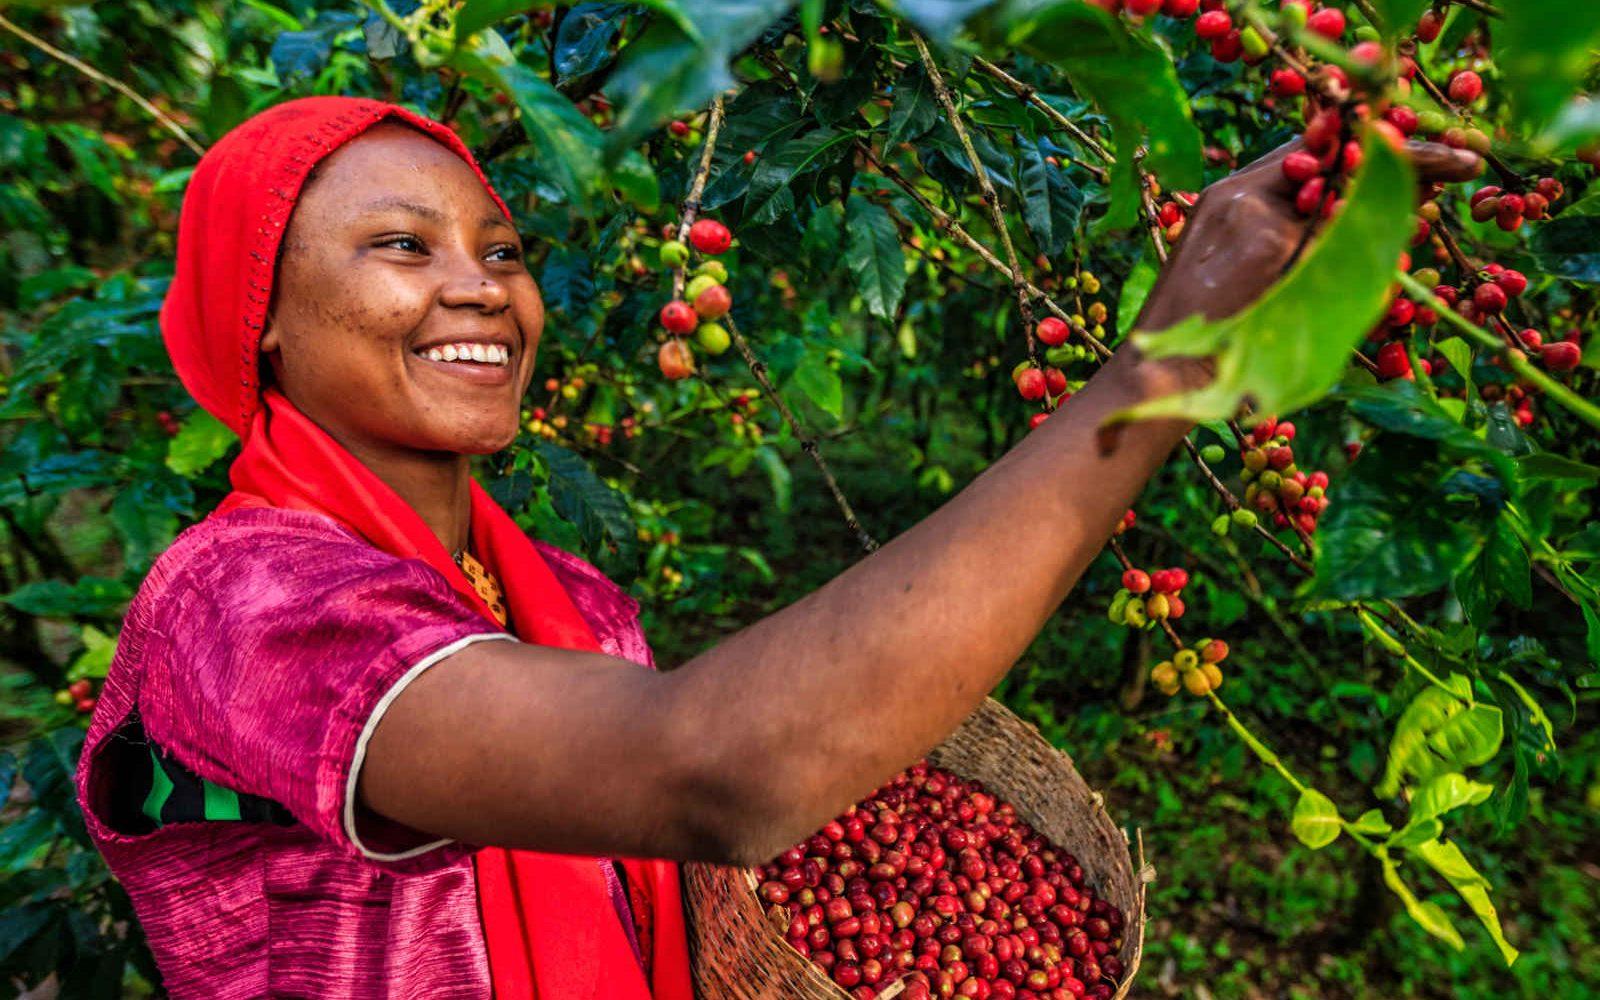 Cueilleuse de café, Ethiopie